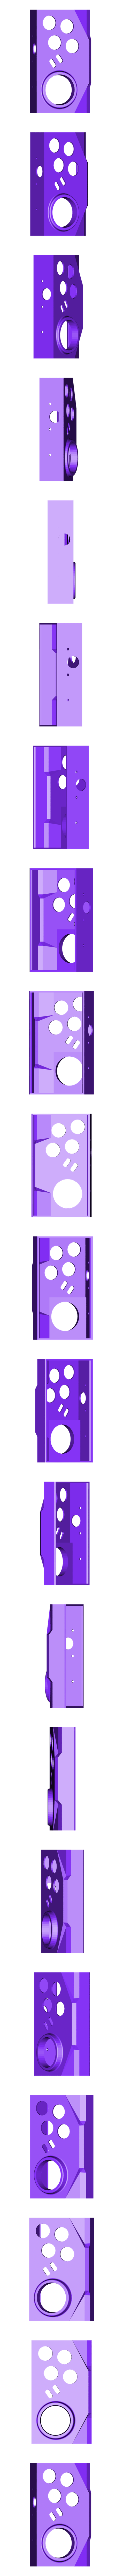 part_5.stl Download free STL file game machine • 3D printing design, kimjh